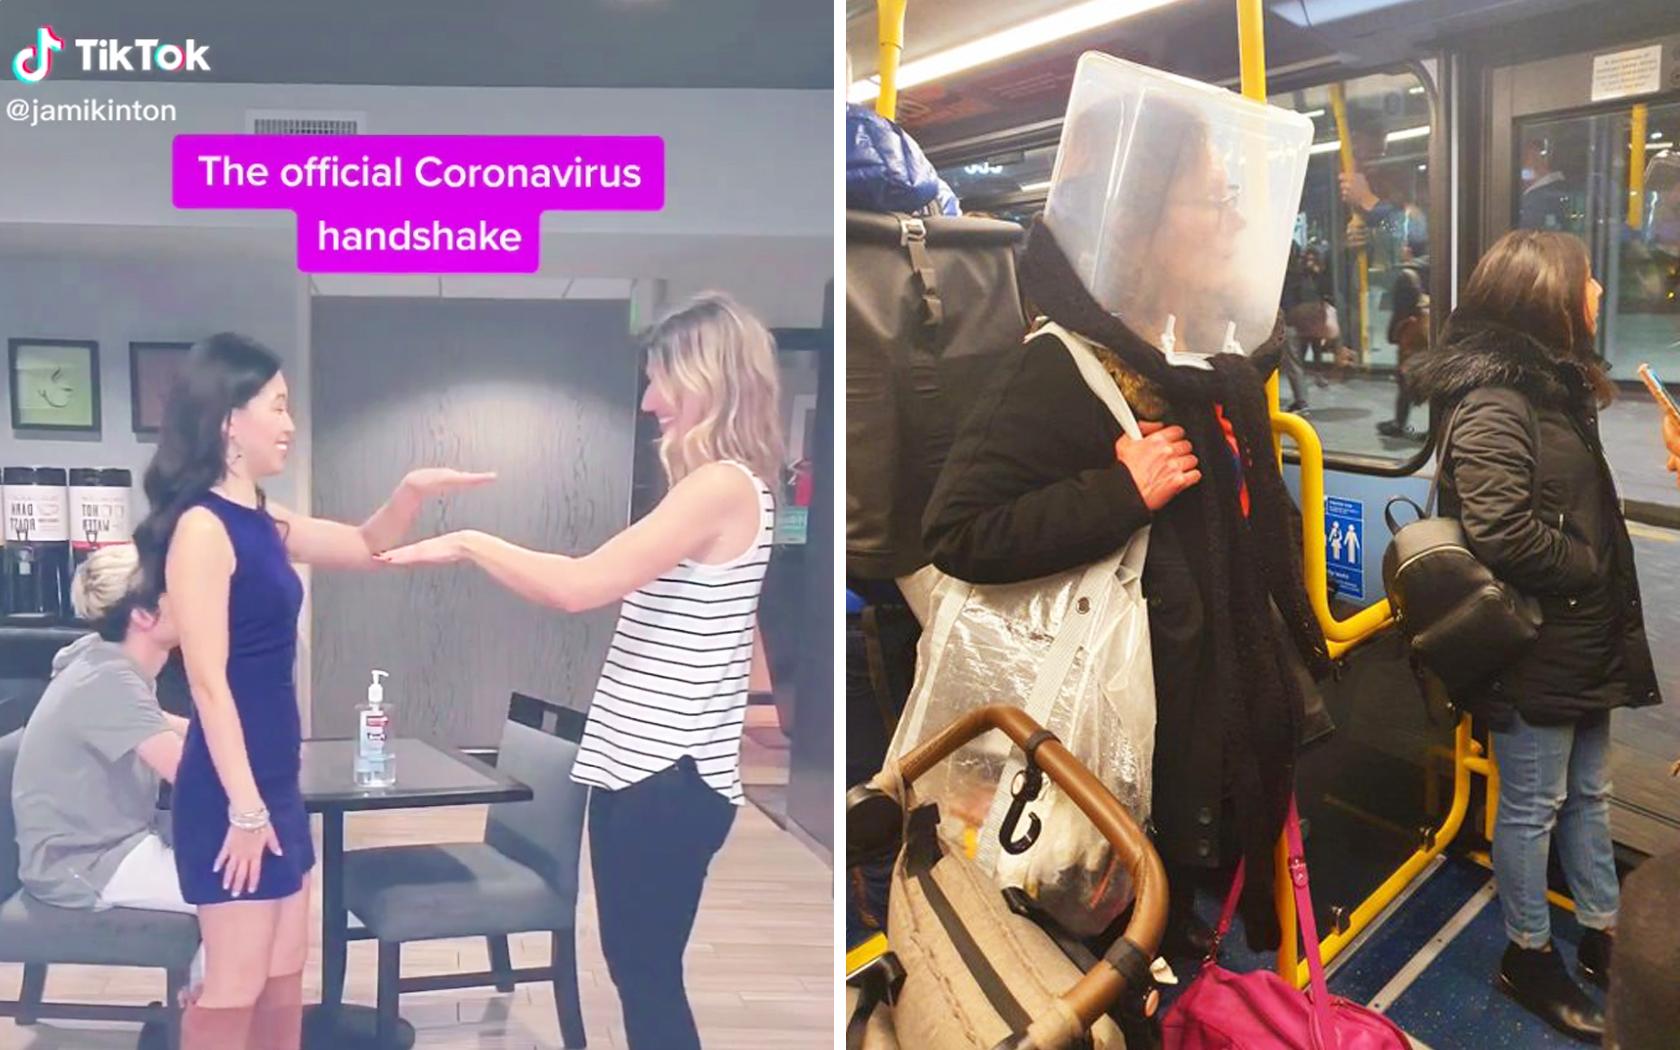 Coronavirus Protection The Funniest Most Bizarre Safety Precautions